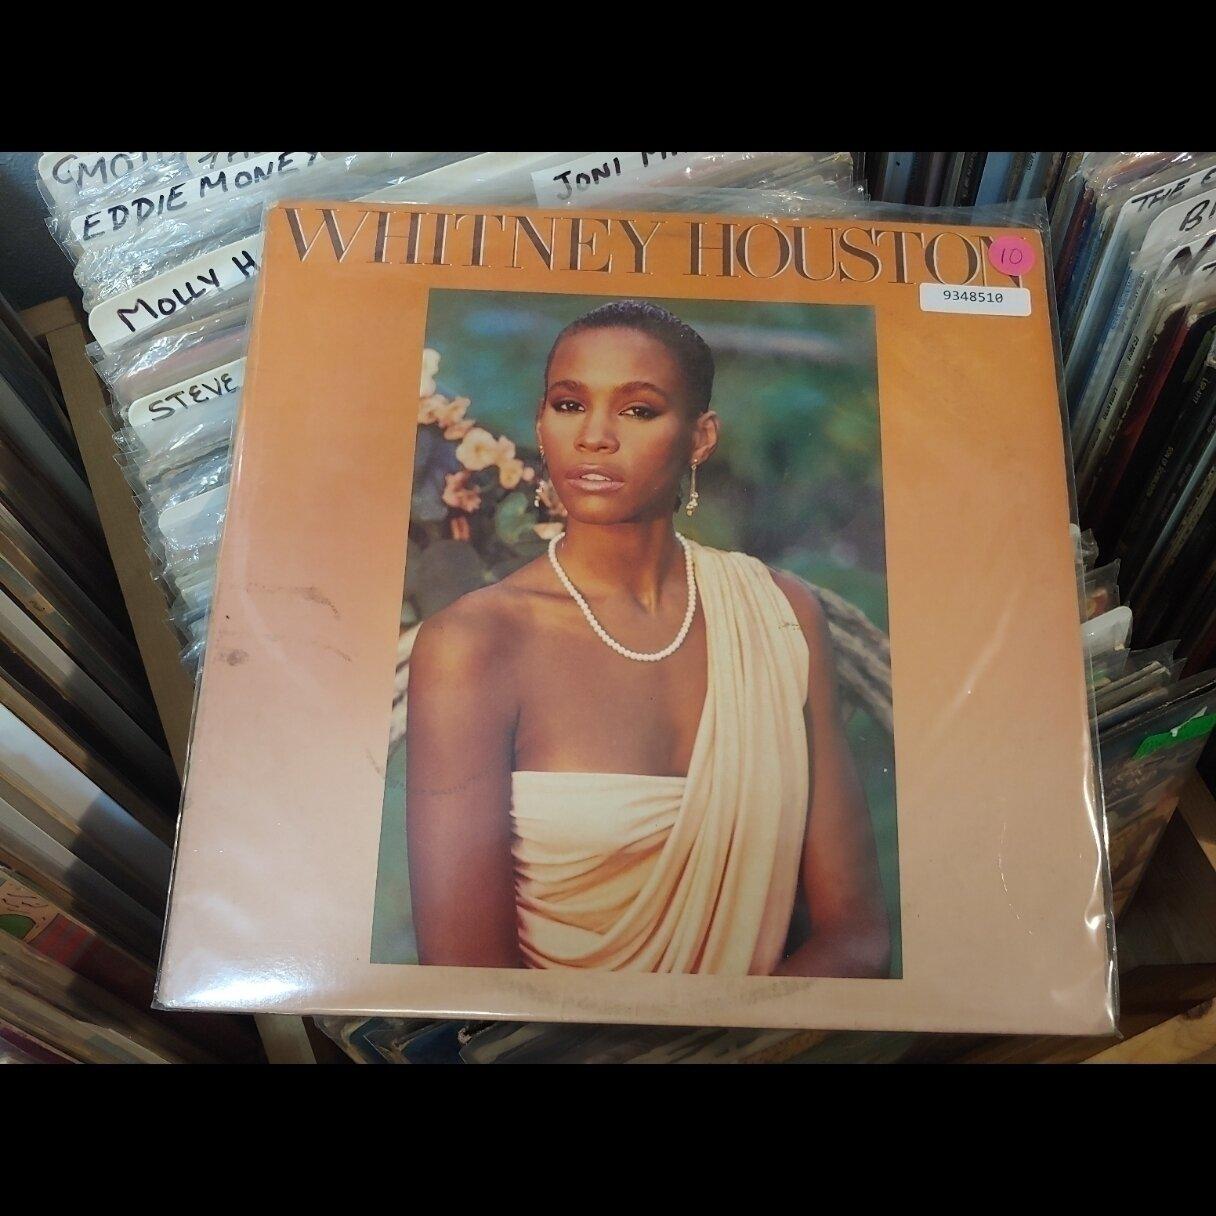 Houston, Whitney - Whitney